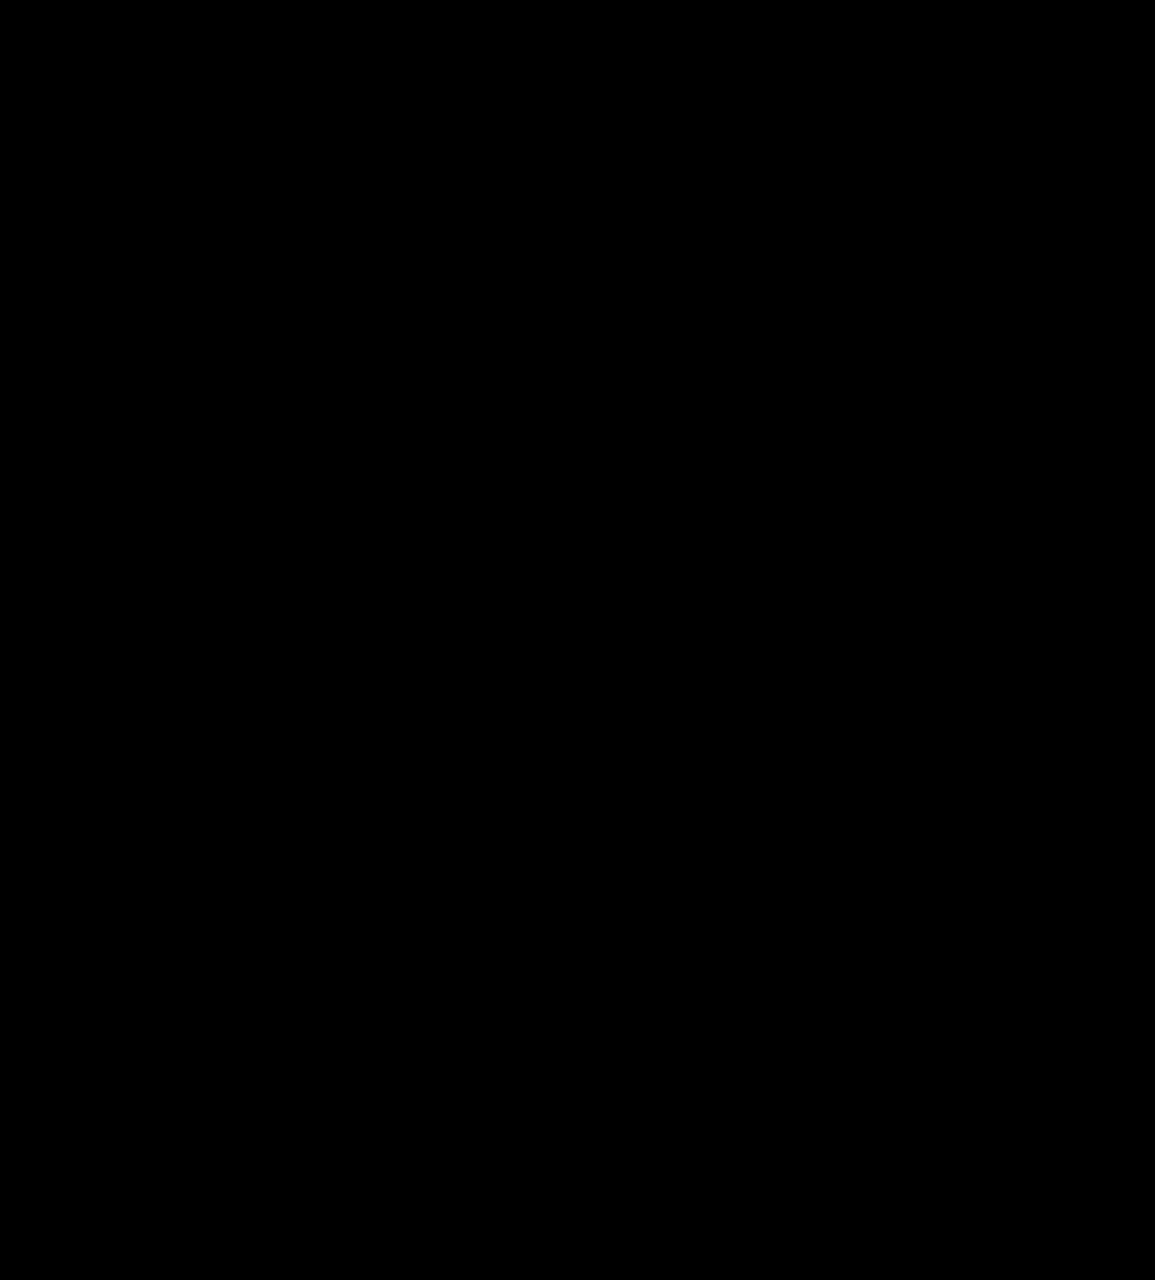 Computer clipart outline. House icons clip art